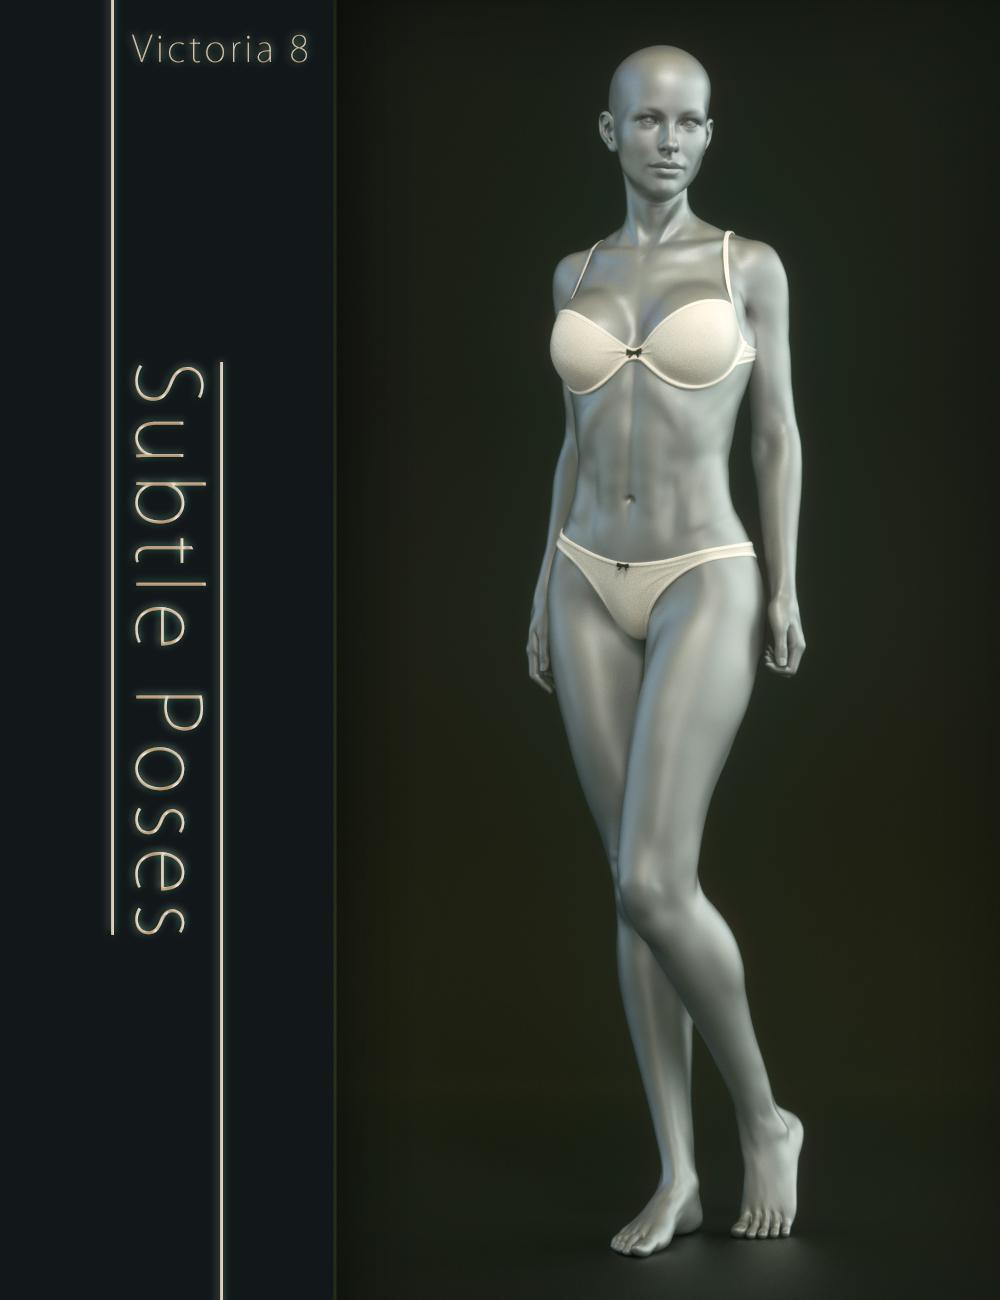 Subtle Poses For Victoria 8 by: Elele, 3D Models by Daz 3D